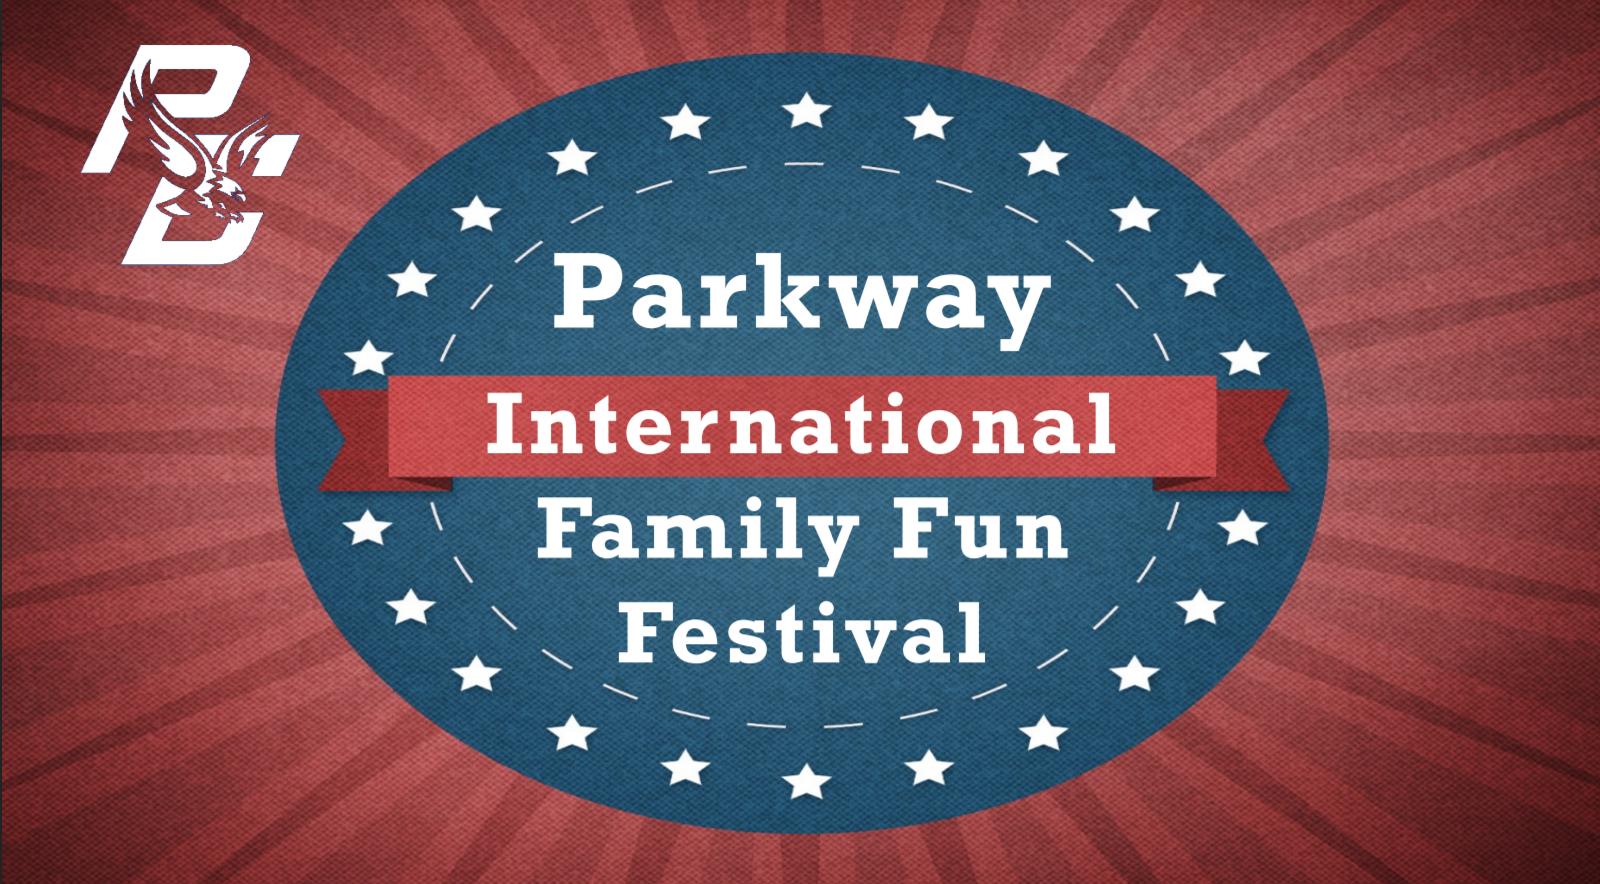 Parkway International Family Fun Festival